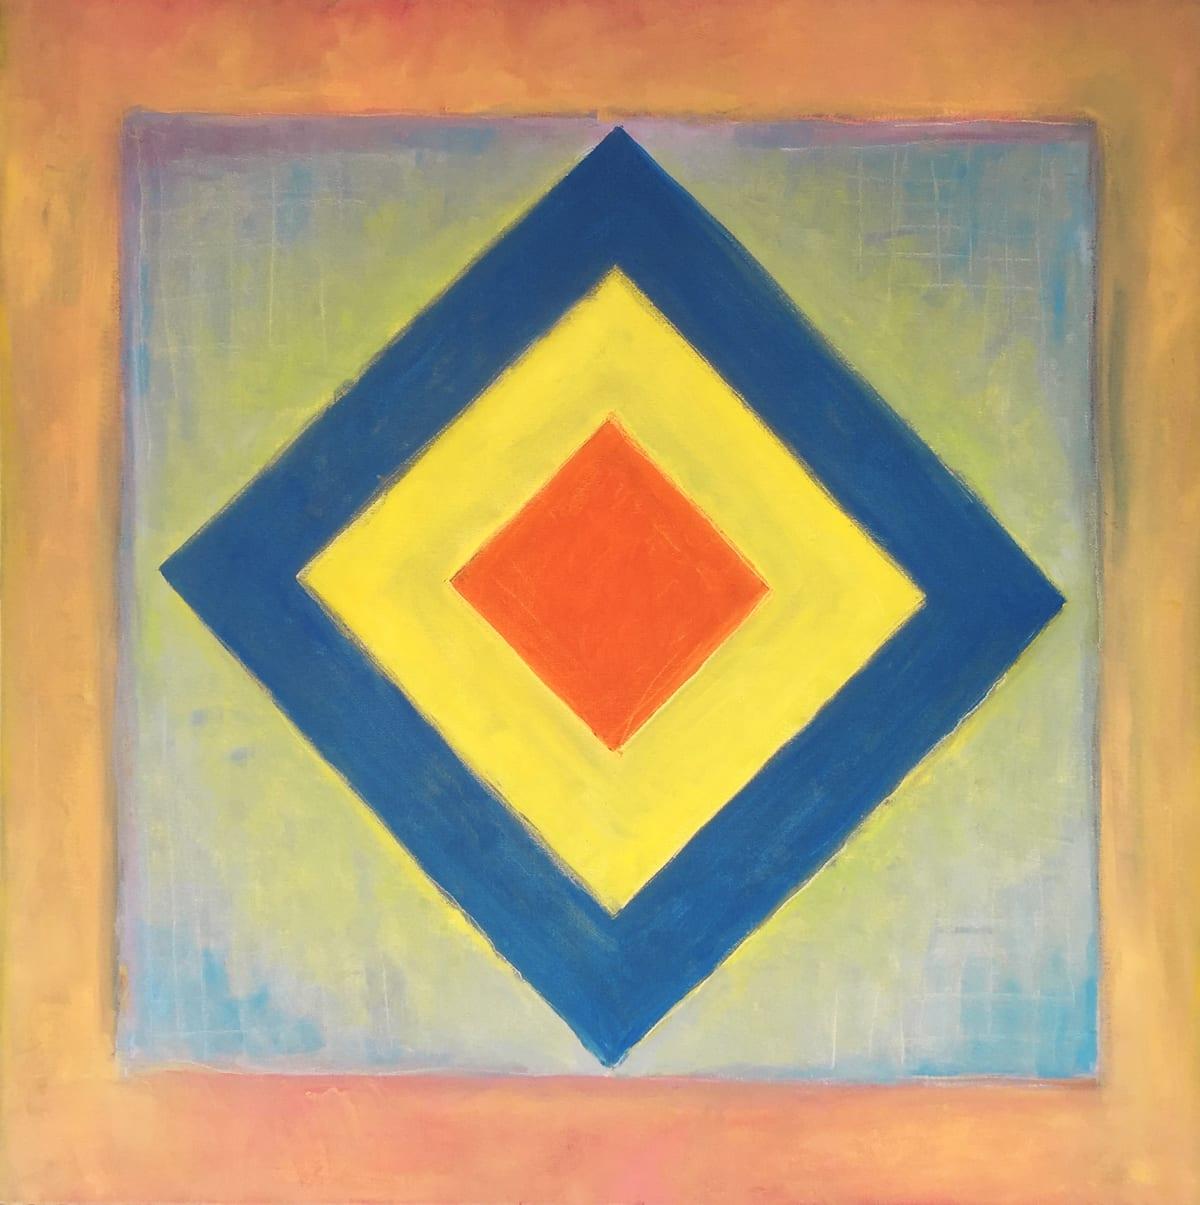 Ari Lankin, Blue Yellow Orange, 2018